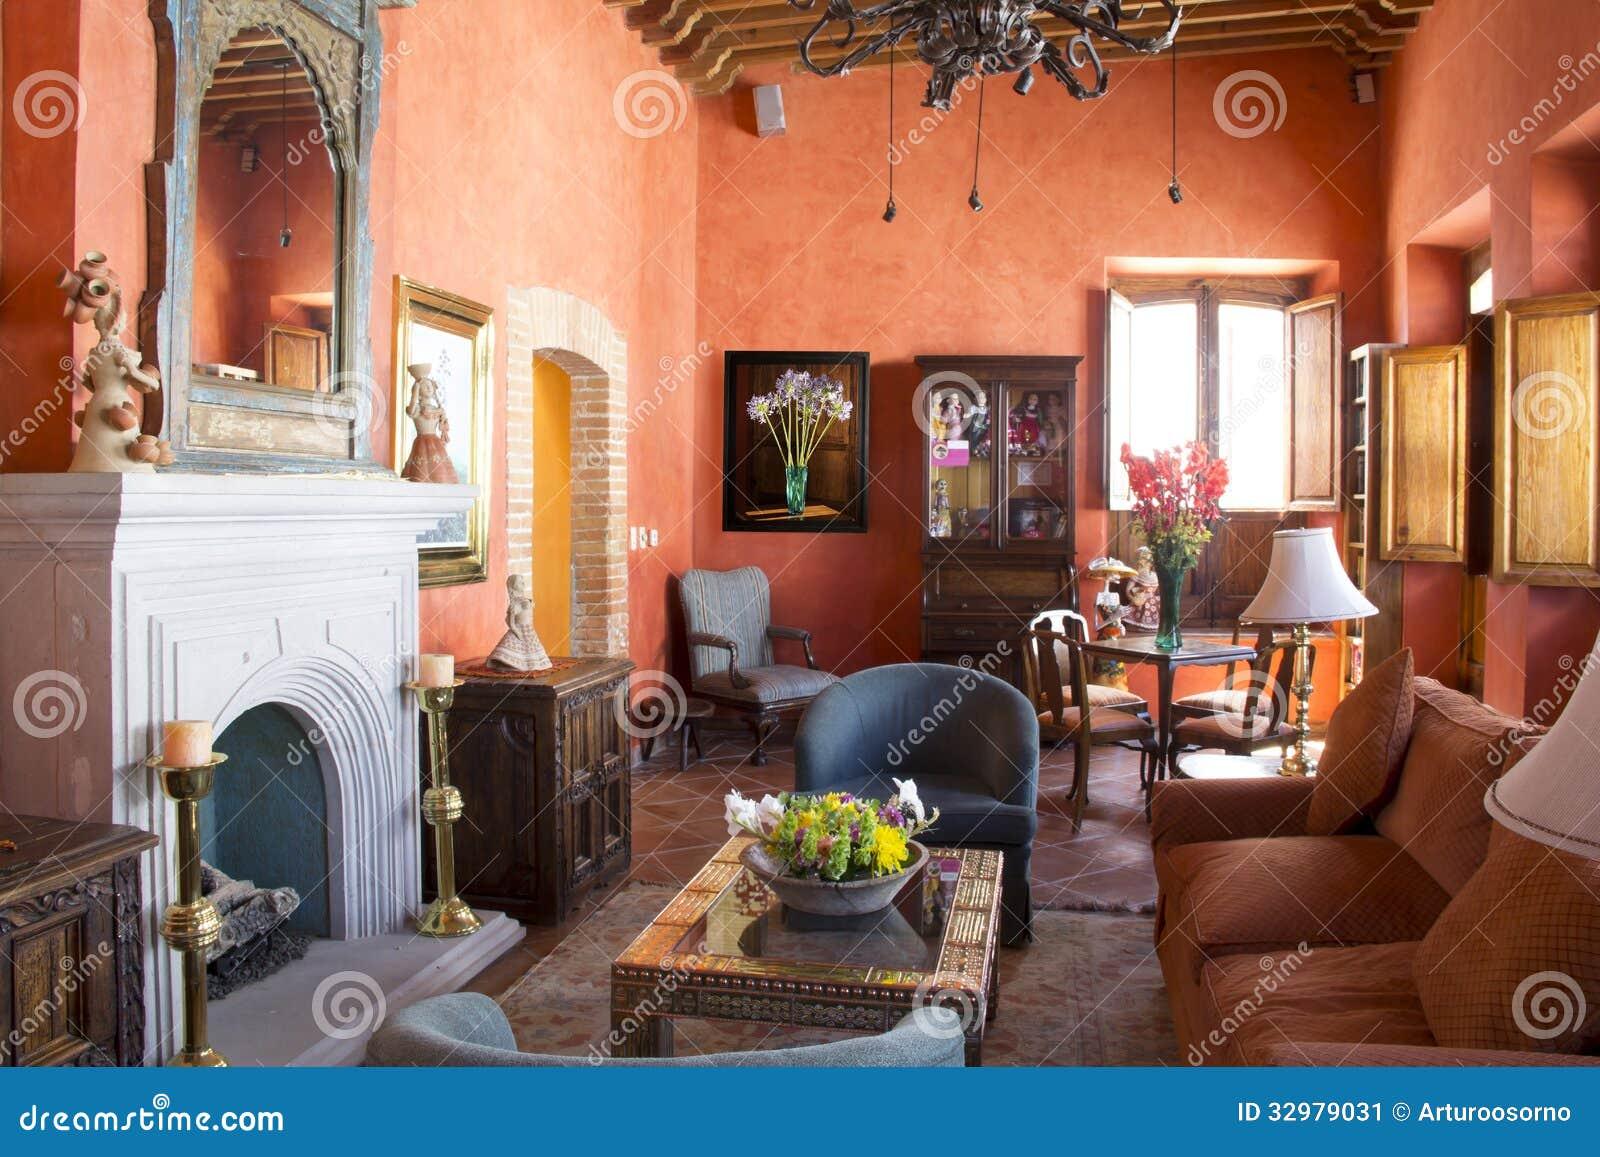 Living Room Stock Image Image 32979031